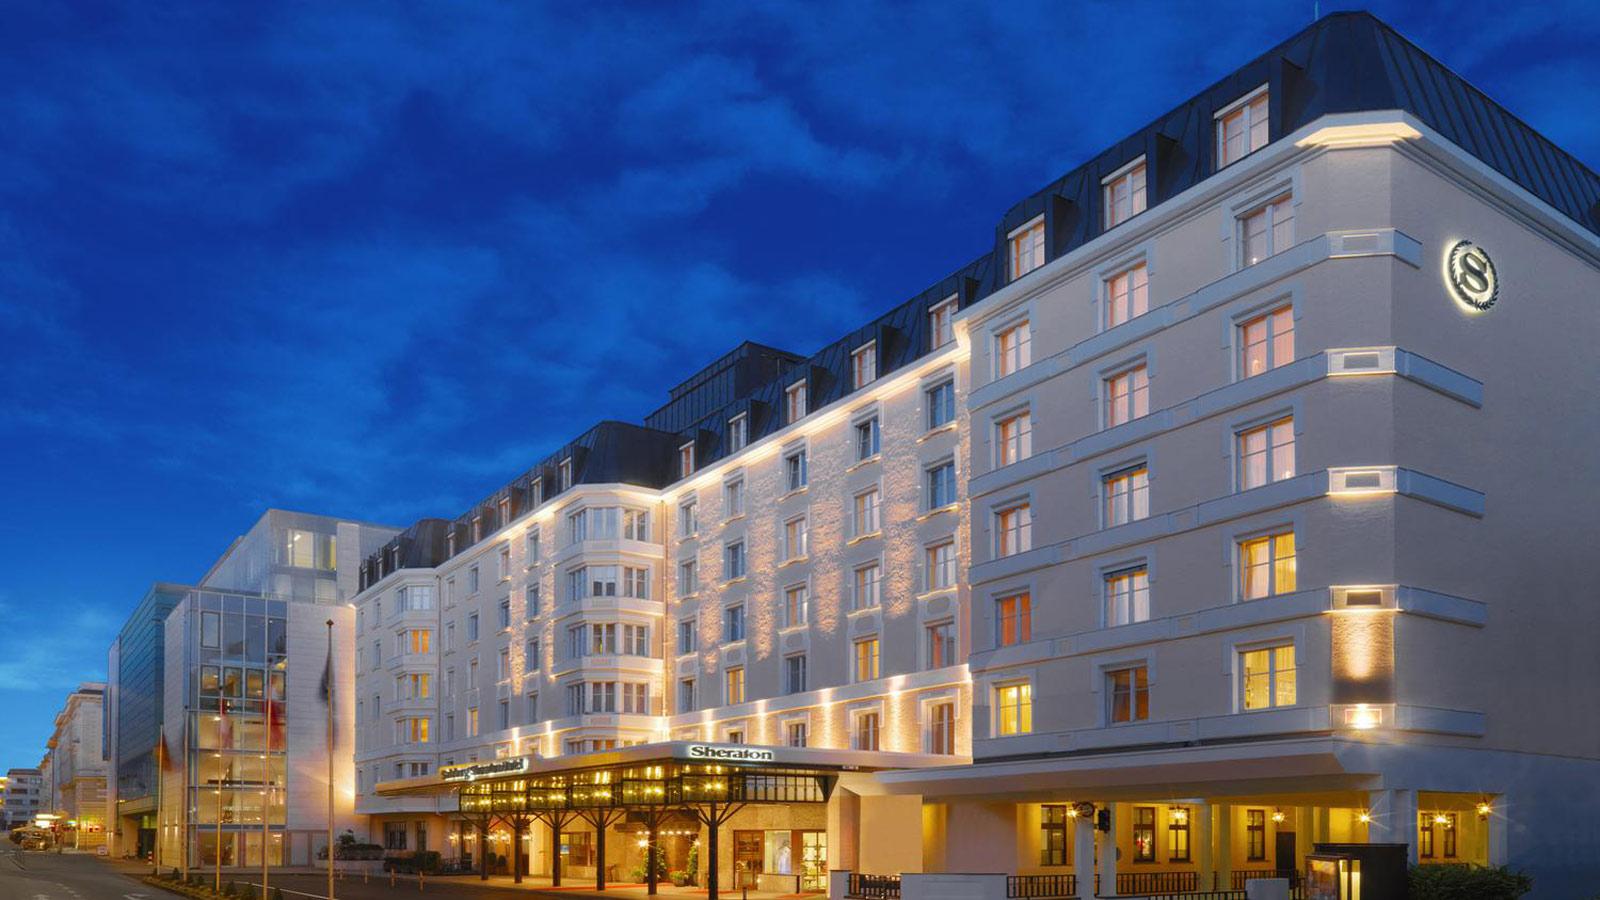 Sheraton Salzburg Hotel Salzburg Austria Flyin Com